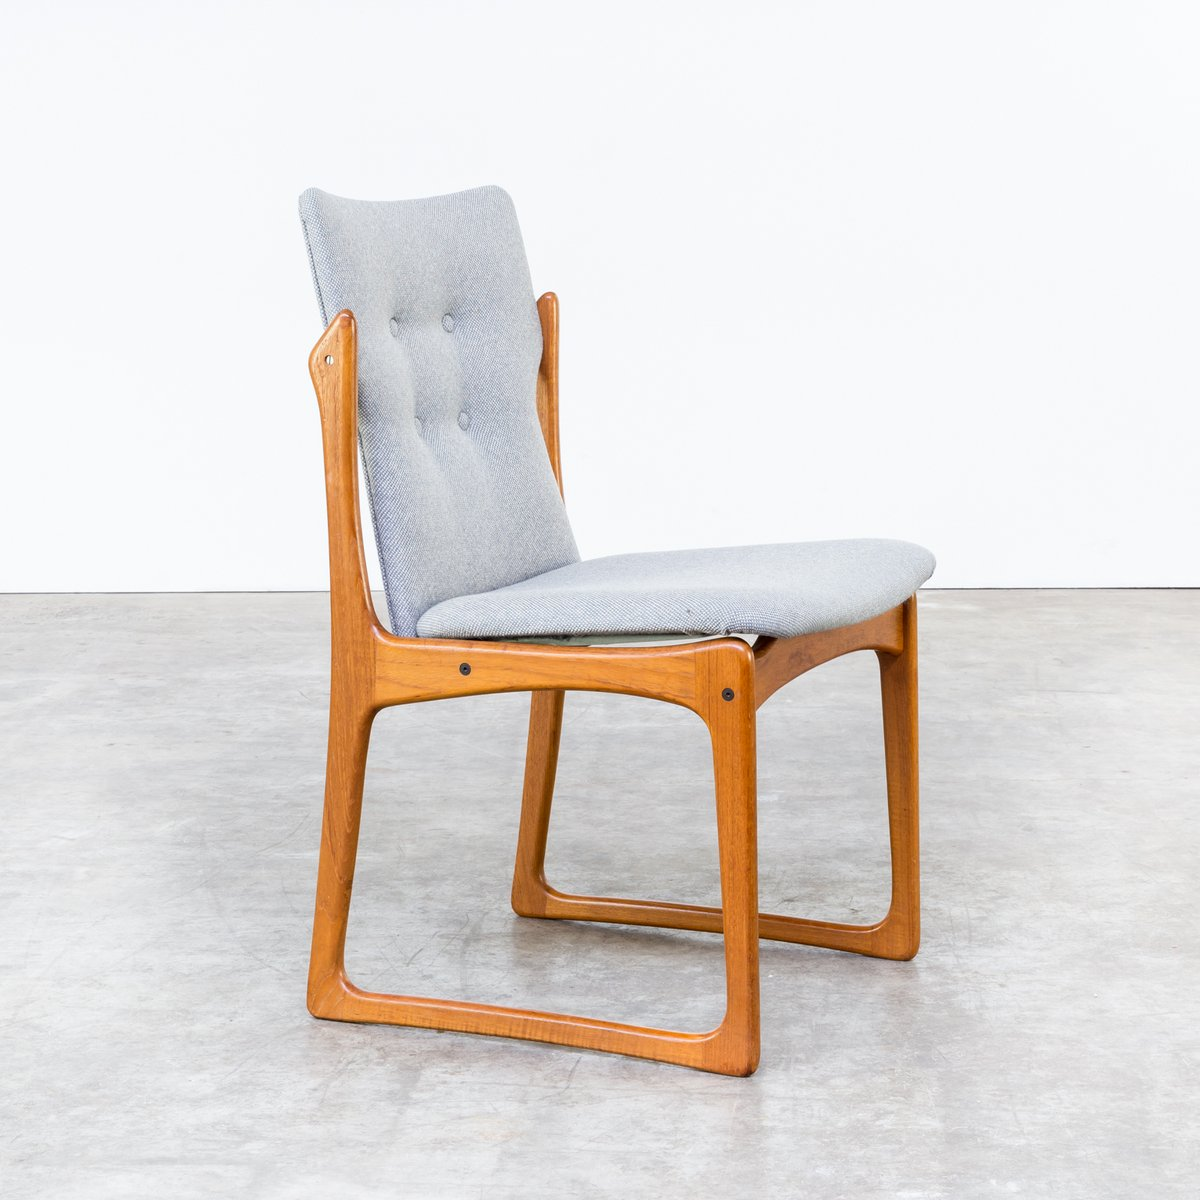 mid century dining room chairs from vamdrup stolefabrik